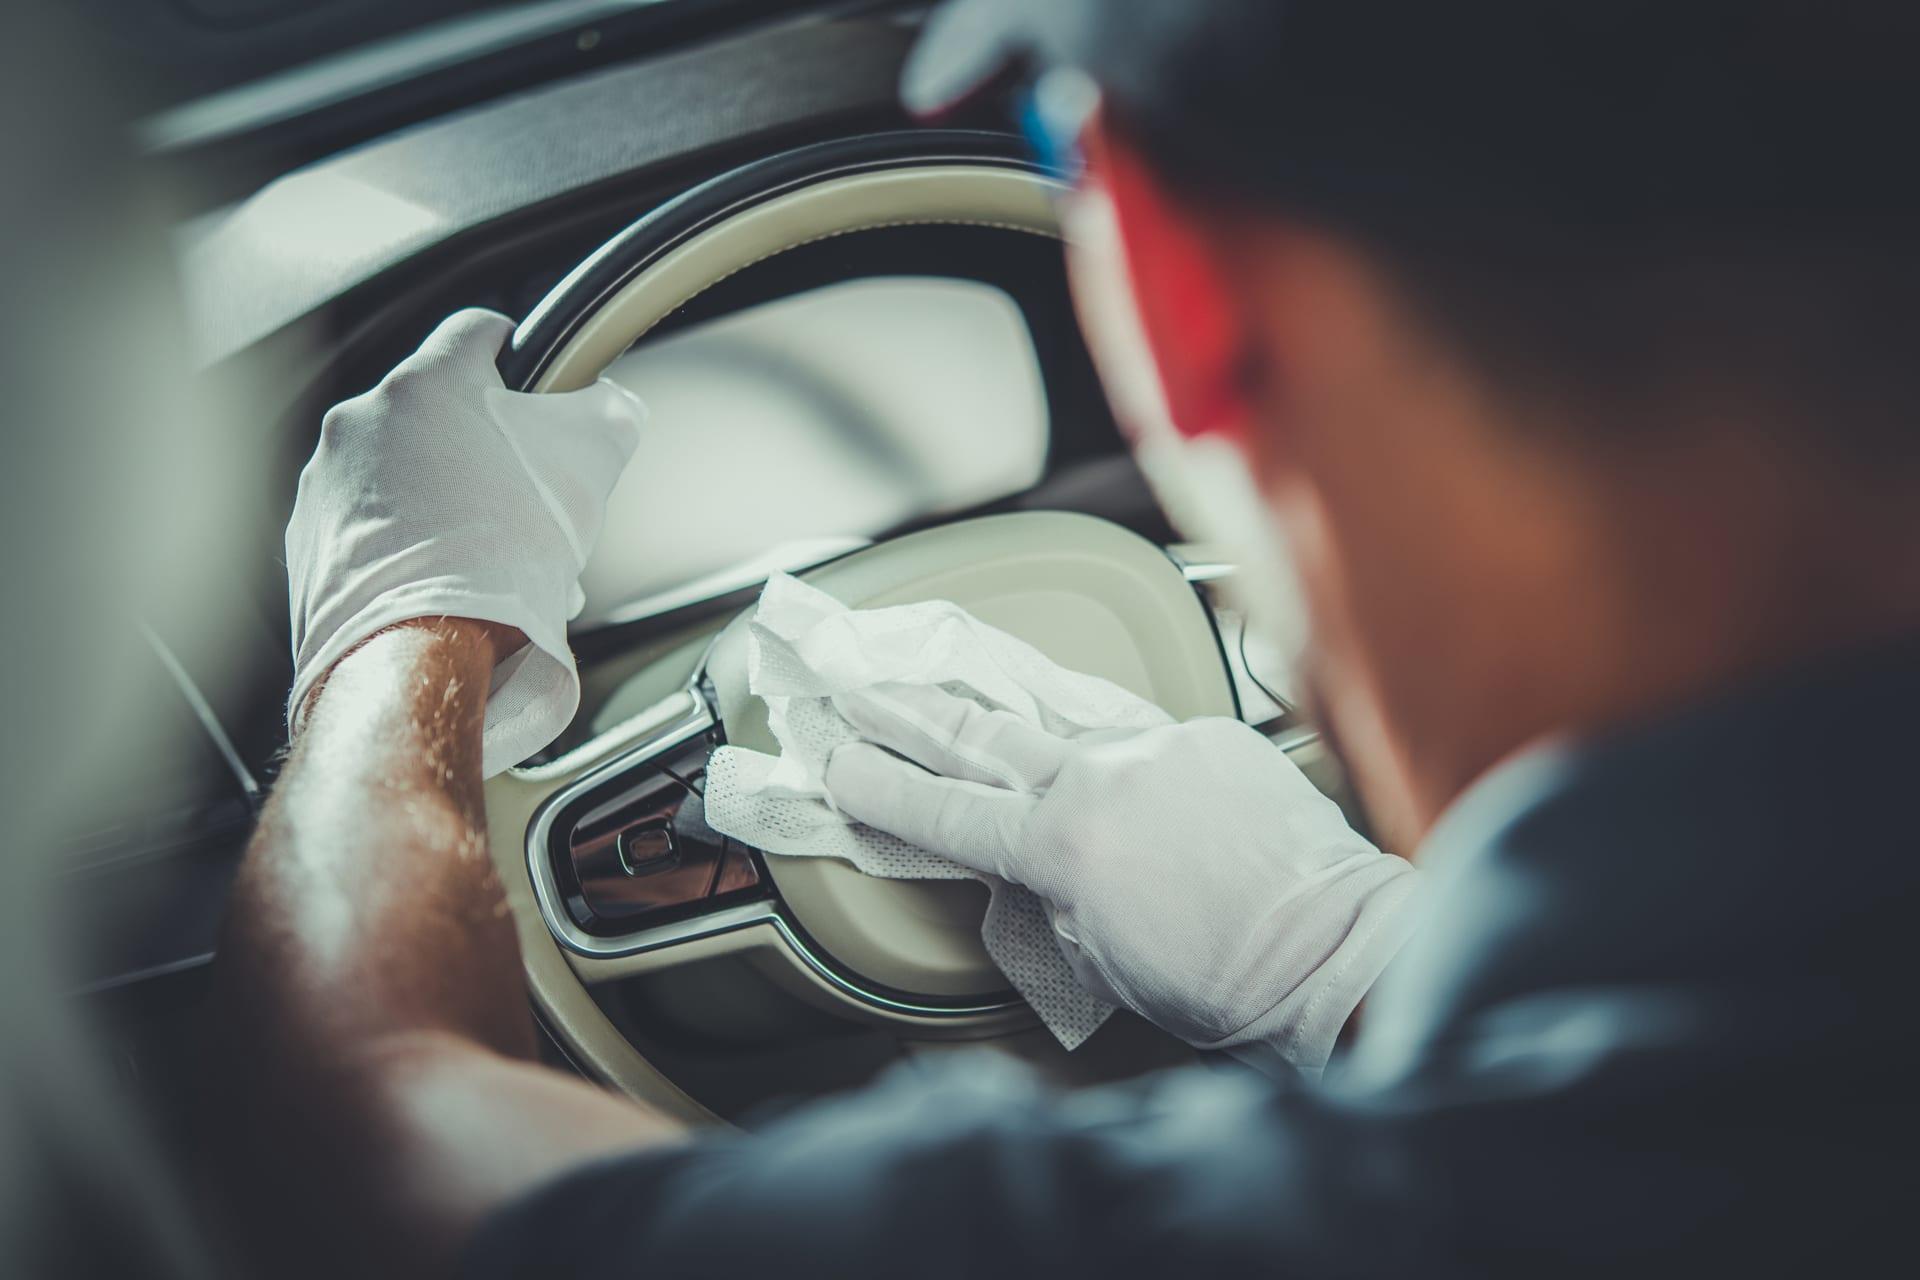 Nettoyage auto à la main